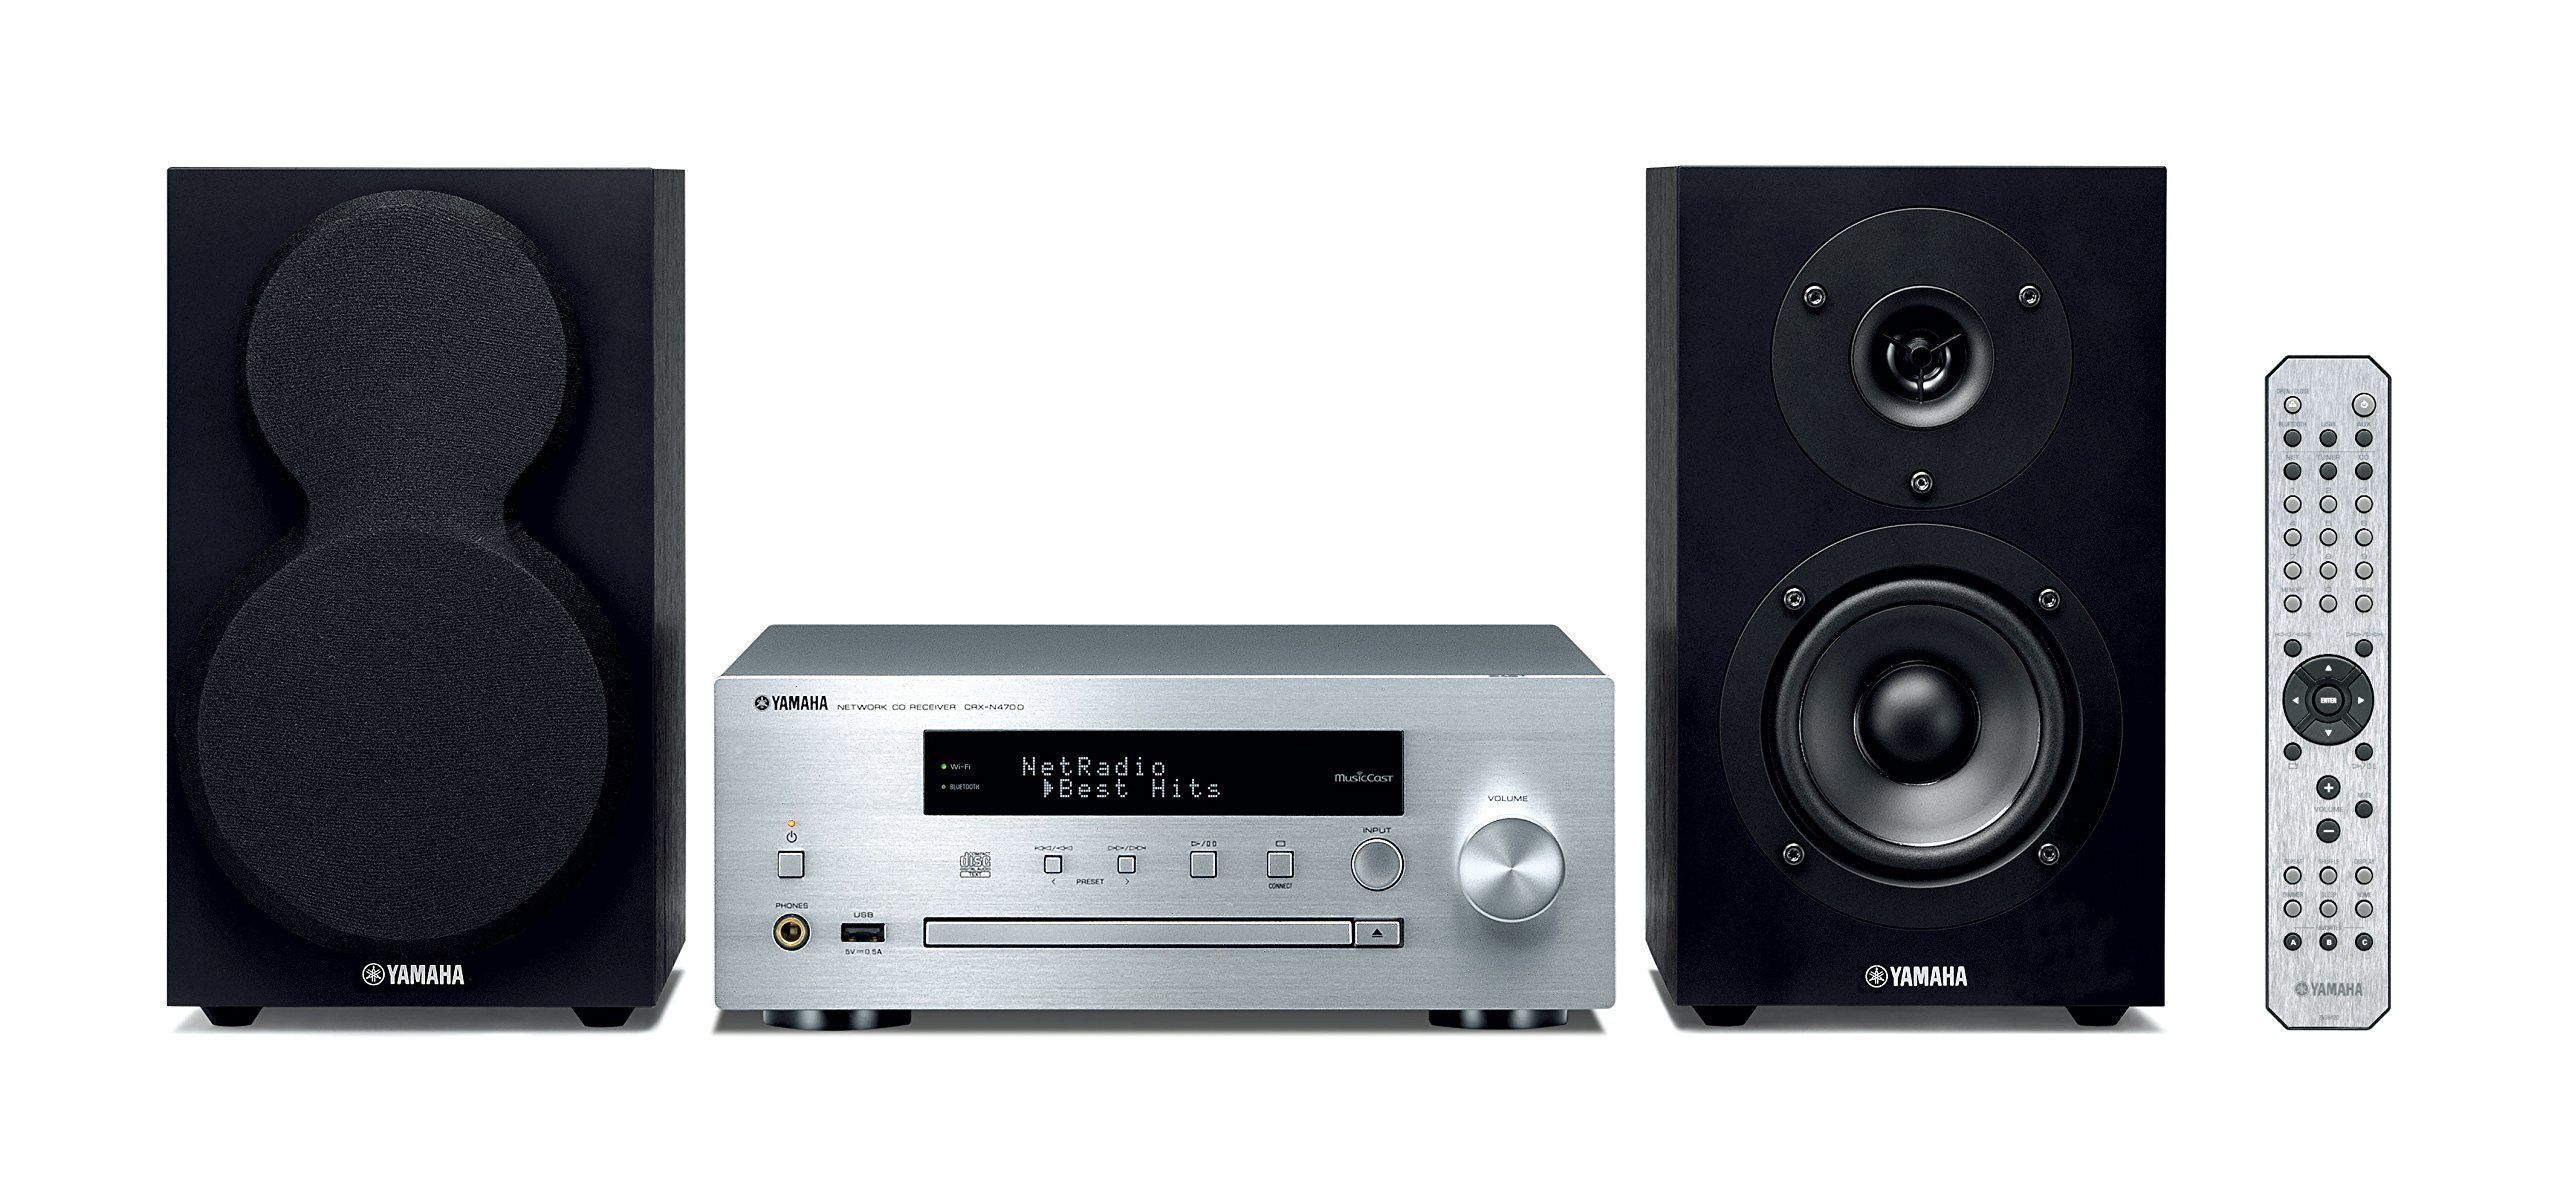 Yamaha MusicCast MCR-N470D - Microcadena, plata: Amazon.es ...